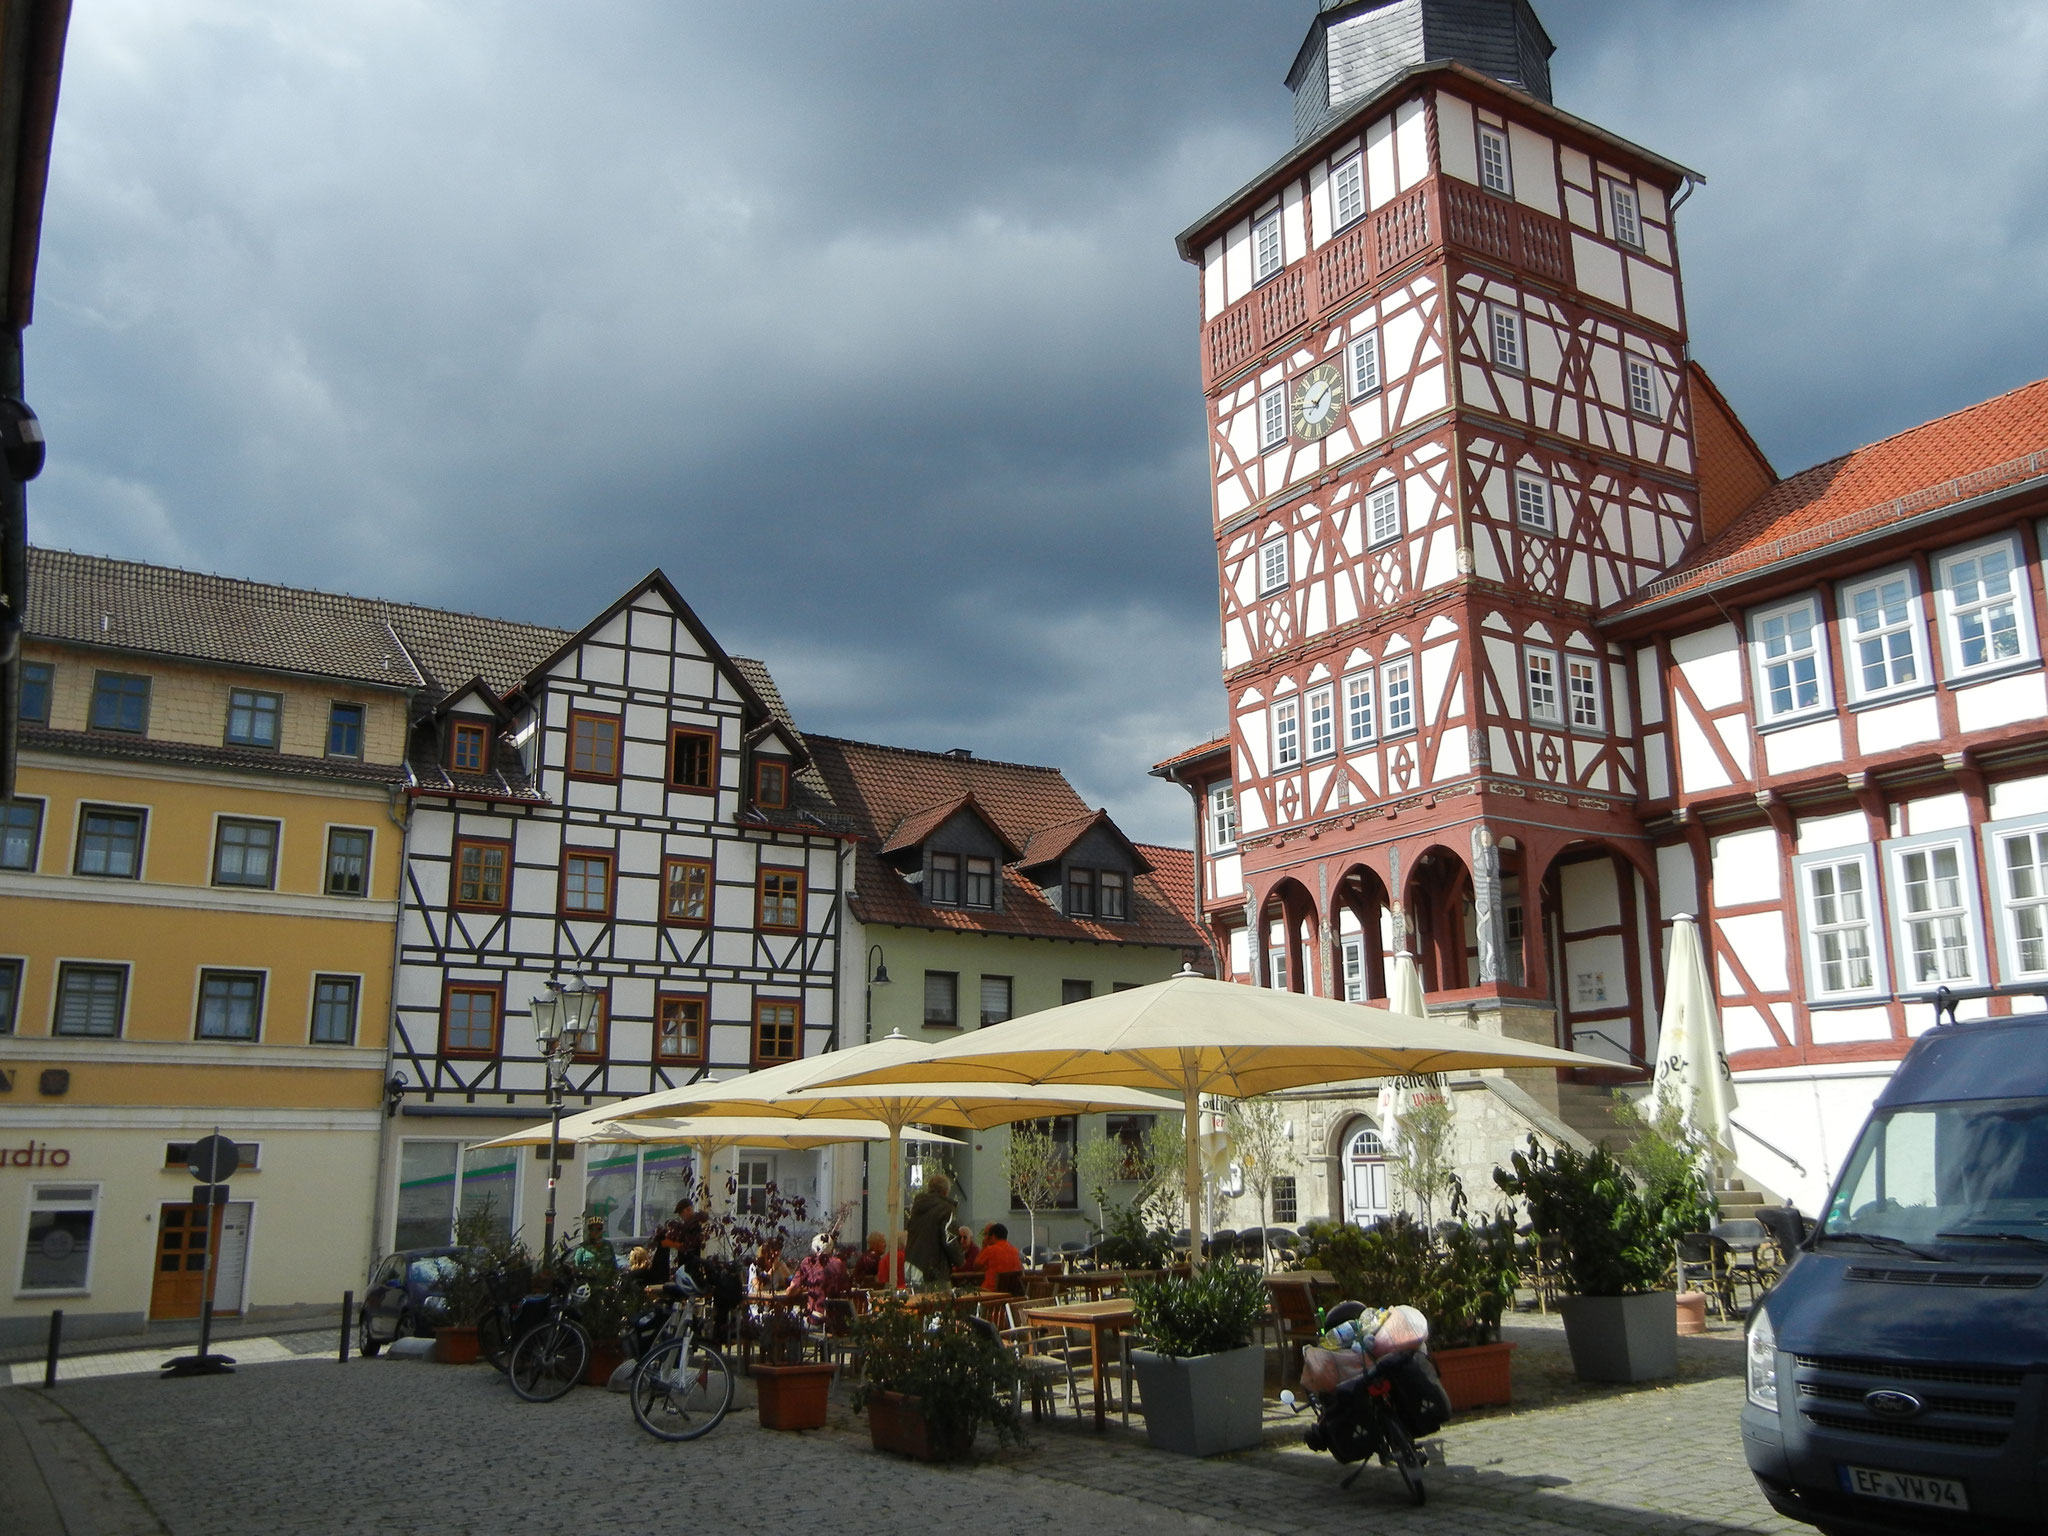 Markt in Treffurt